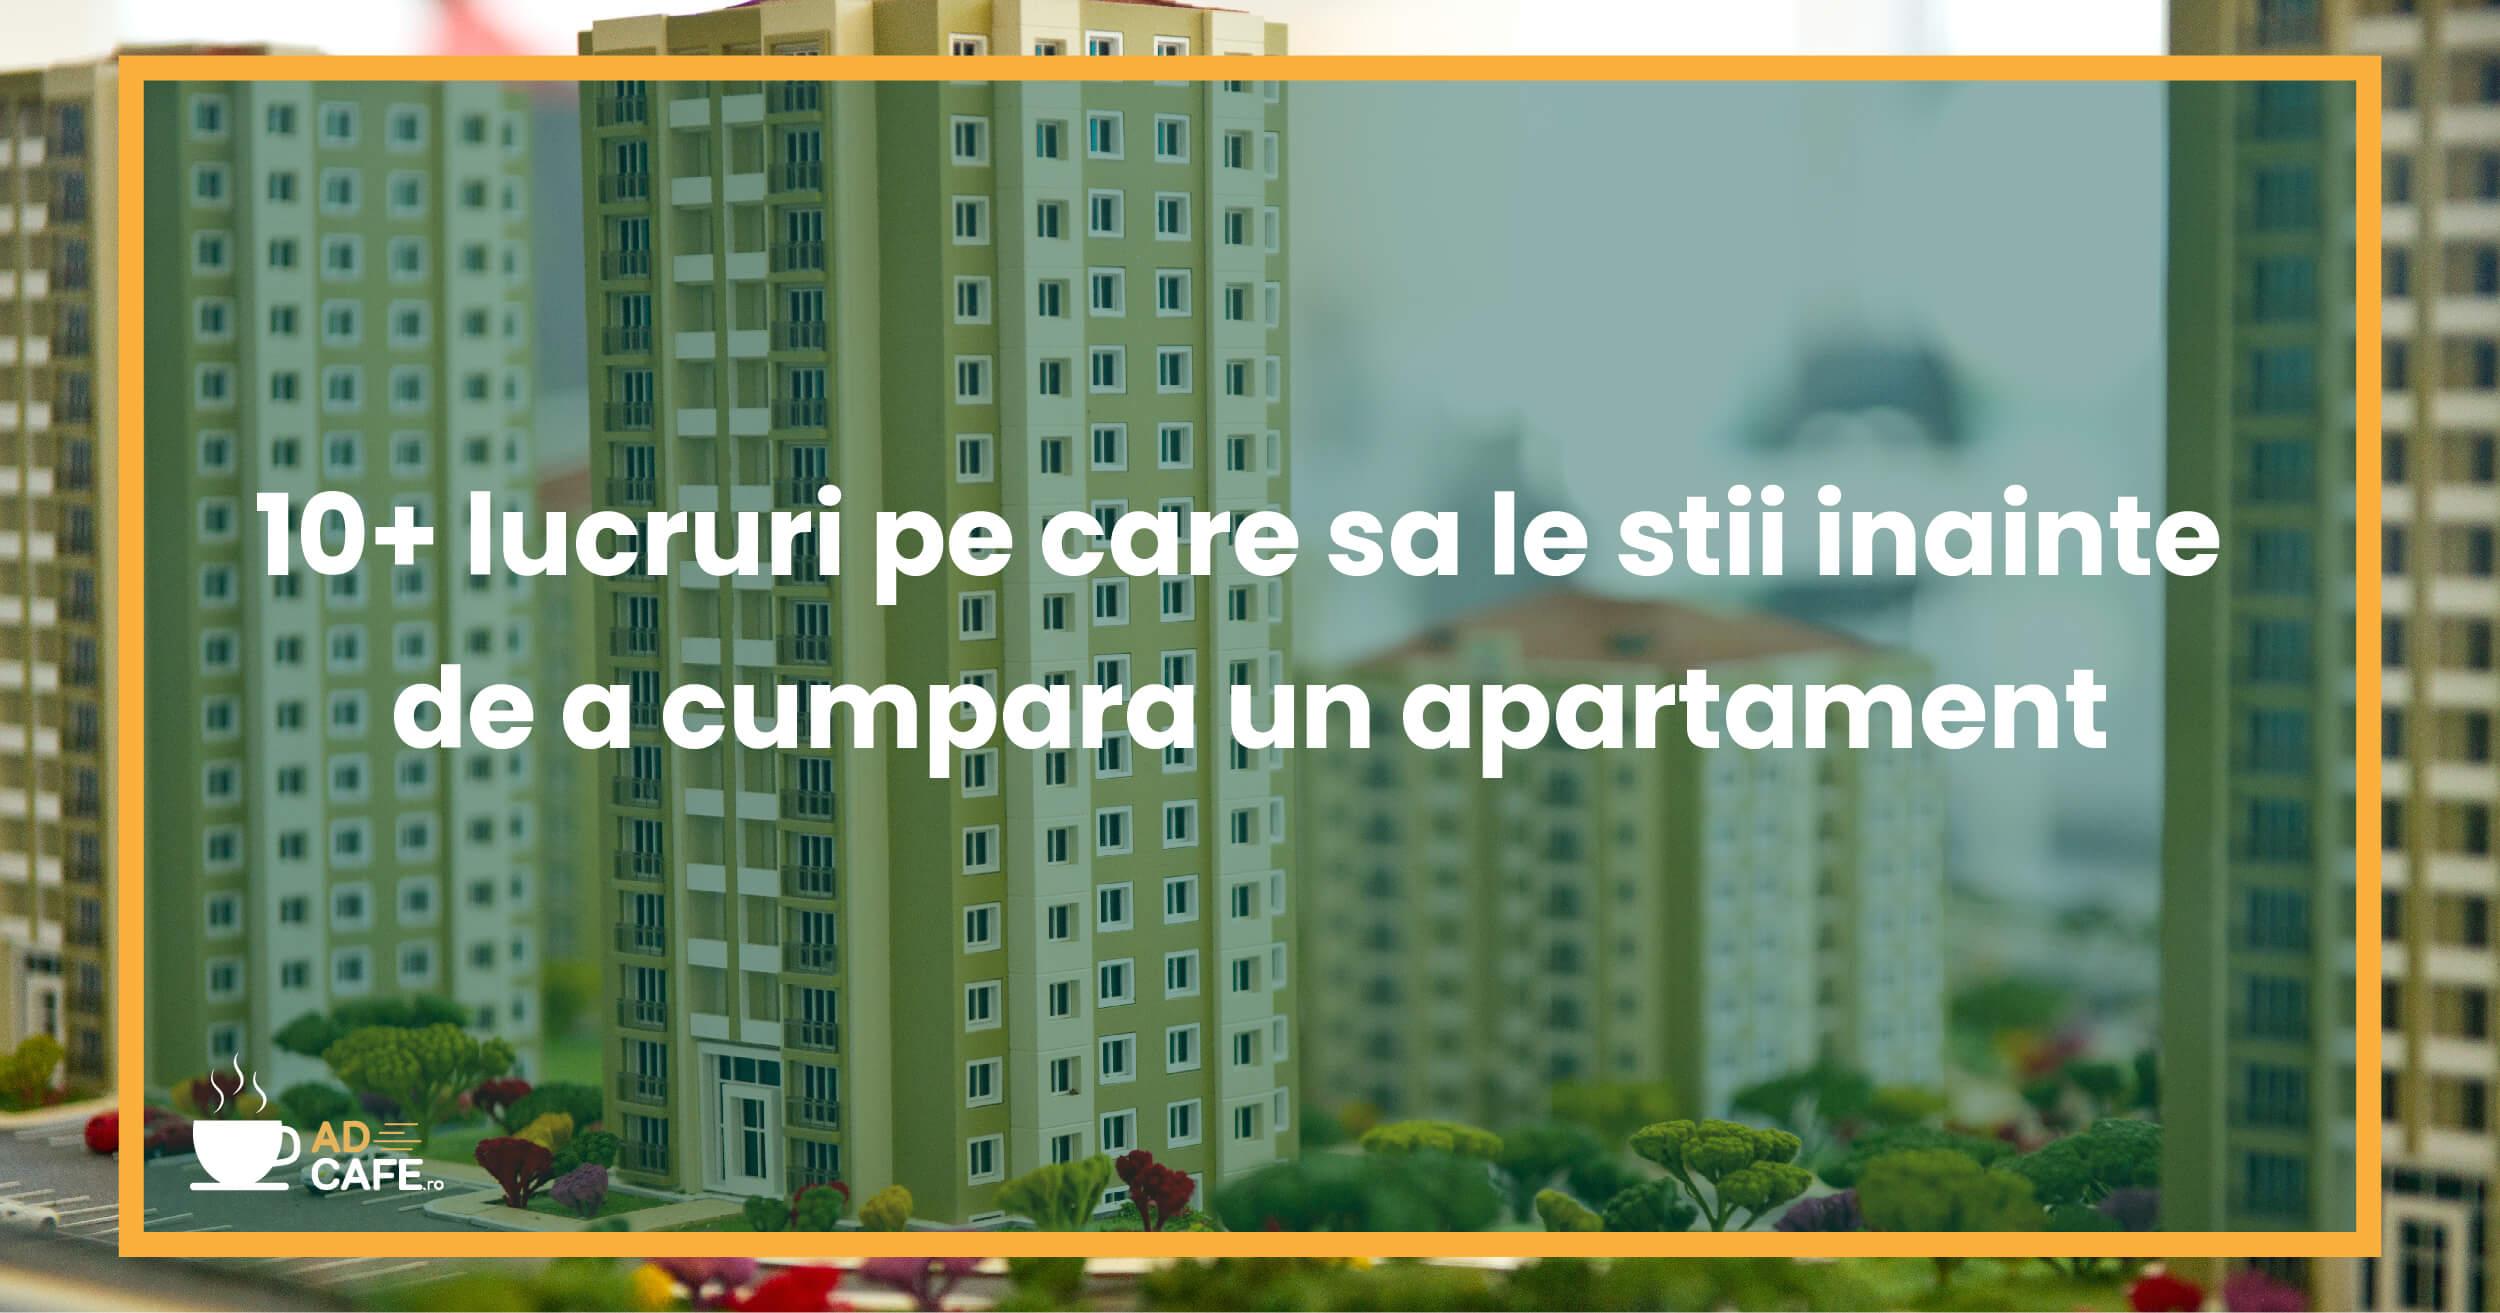 10+ lucruri pe care sa le stii inainte de a cumpara un apartament